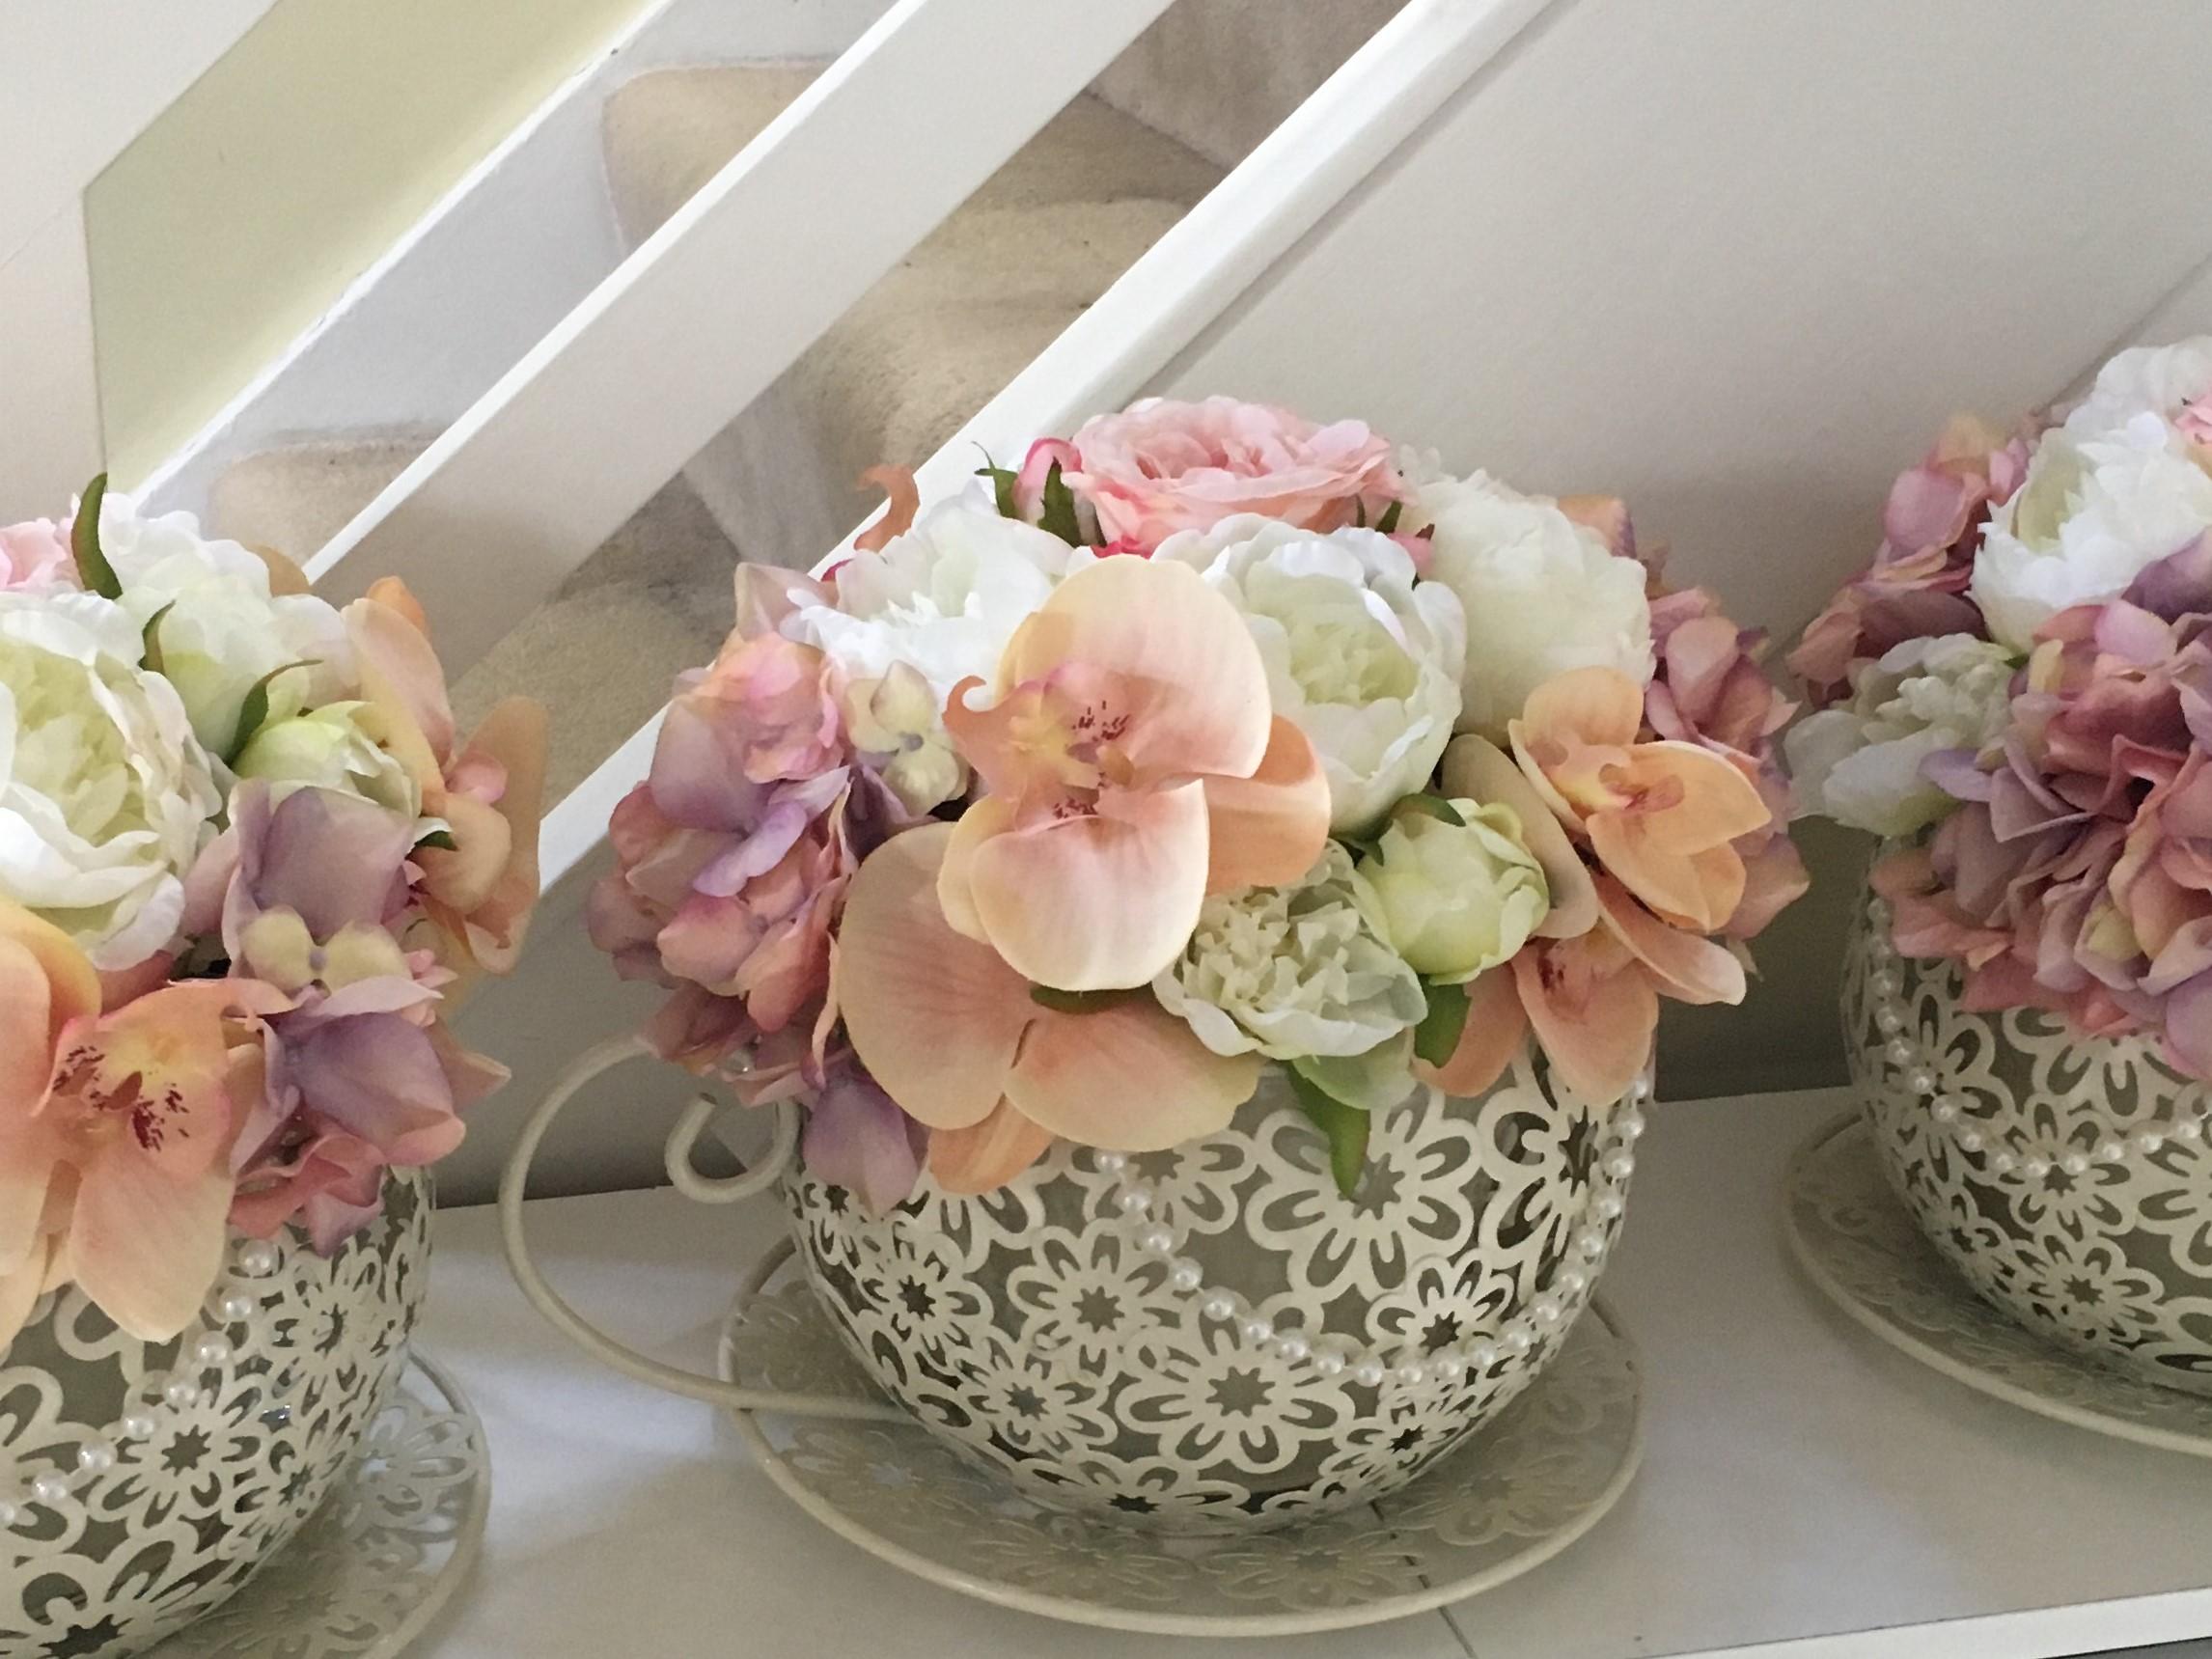 Pictures of silk flower arrangements flowers healthy silk fl arrangements petal stems mightylinksfo